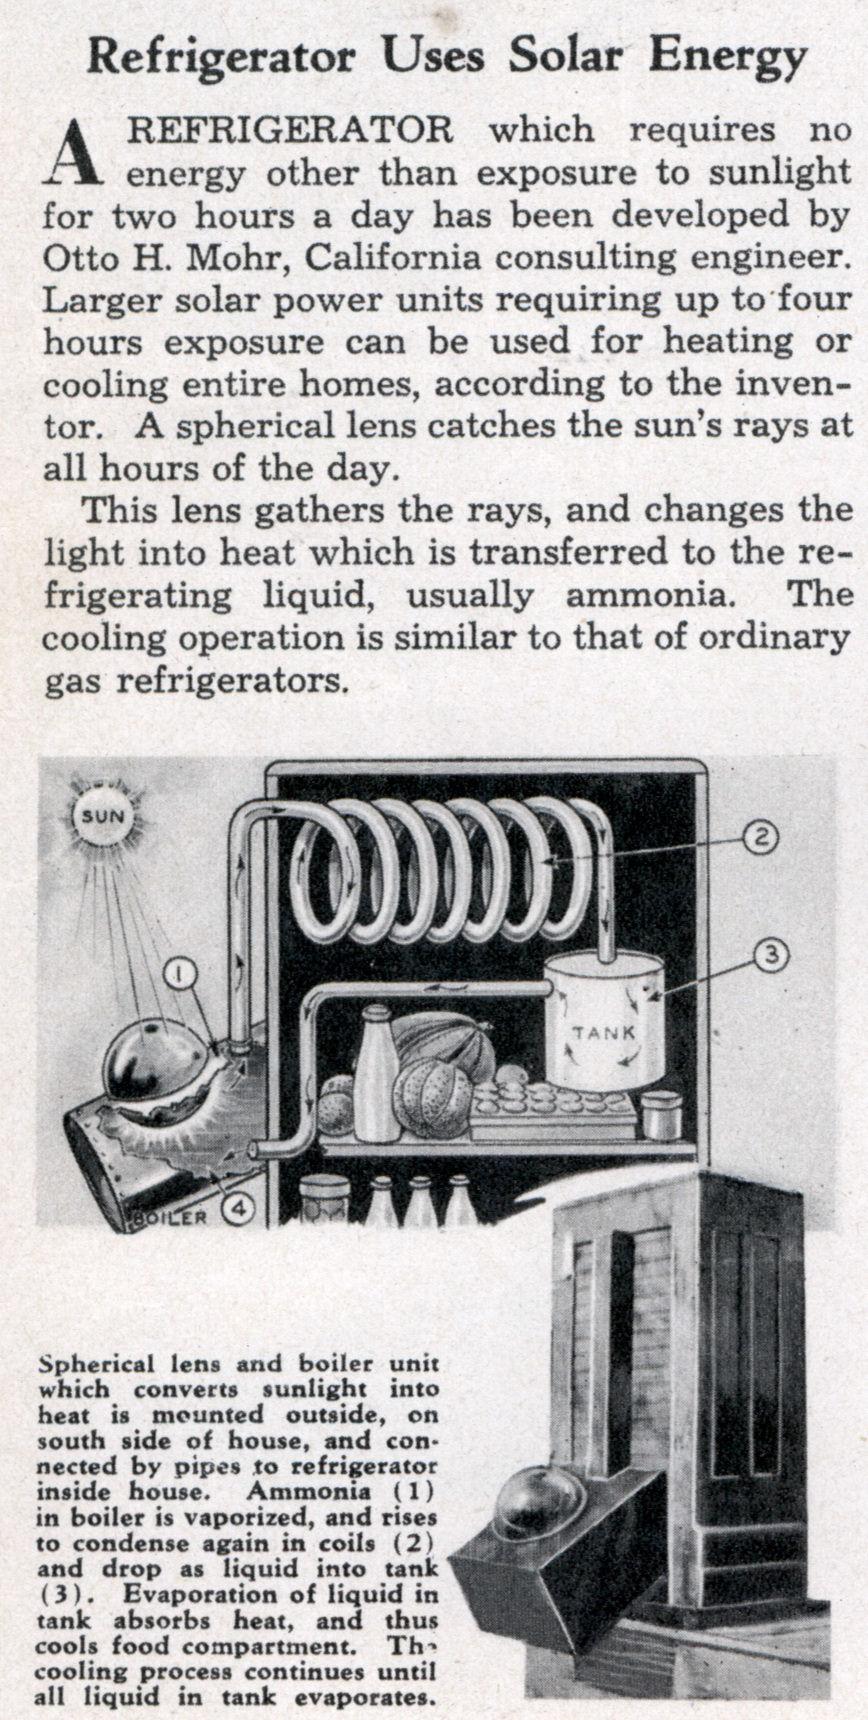 Refrigerator Energy Refrigerator Uses Solar Energy